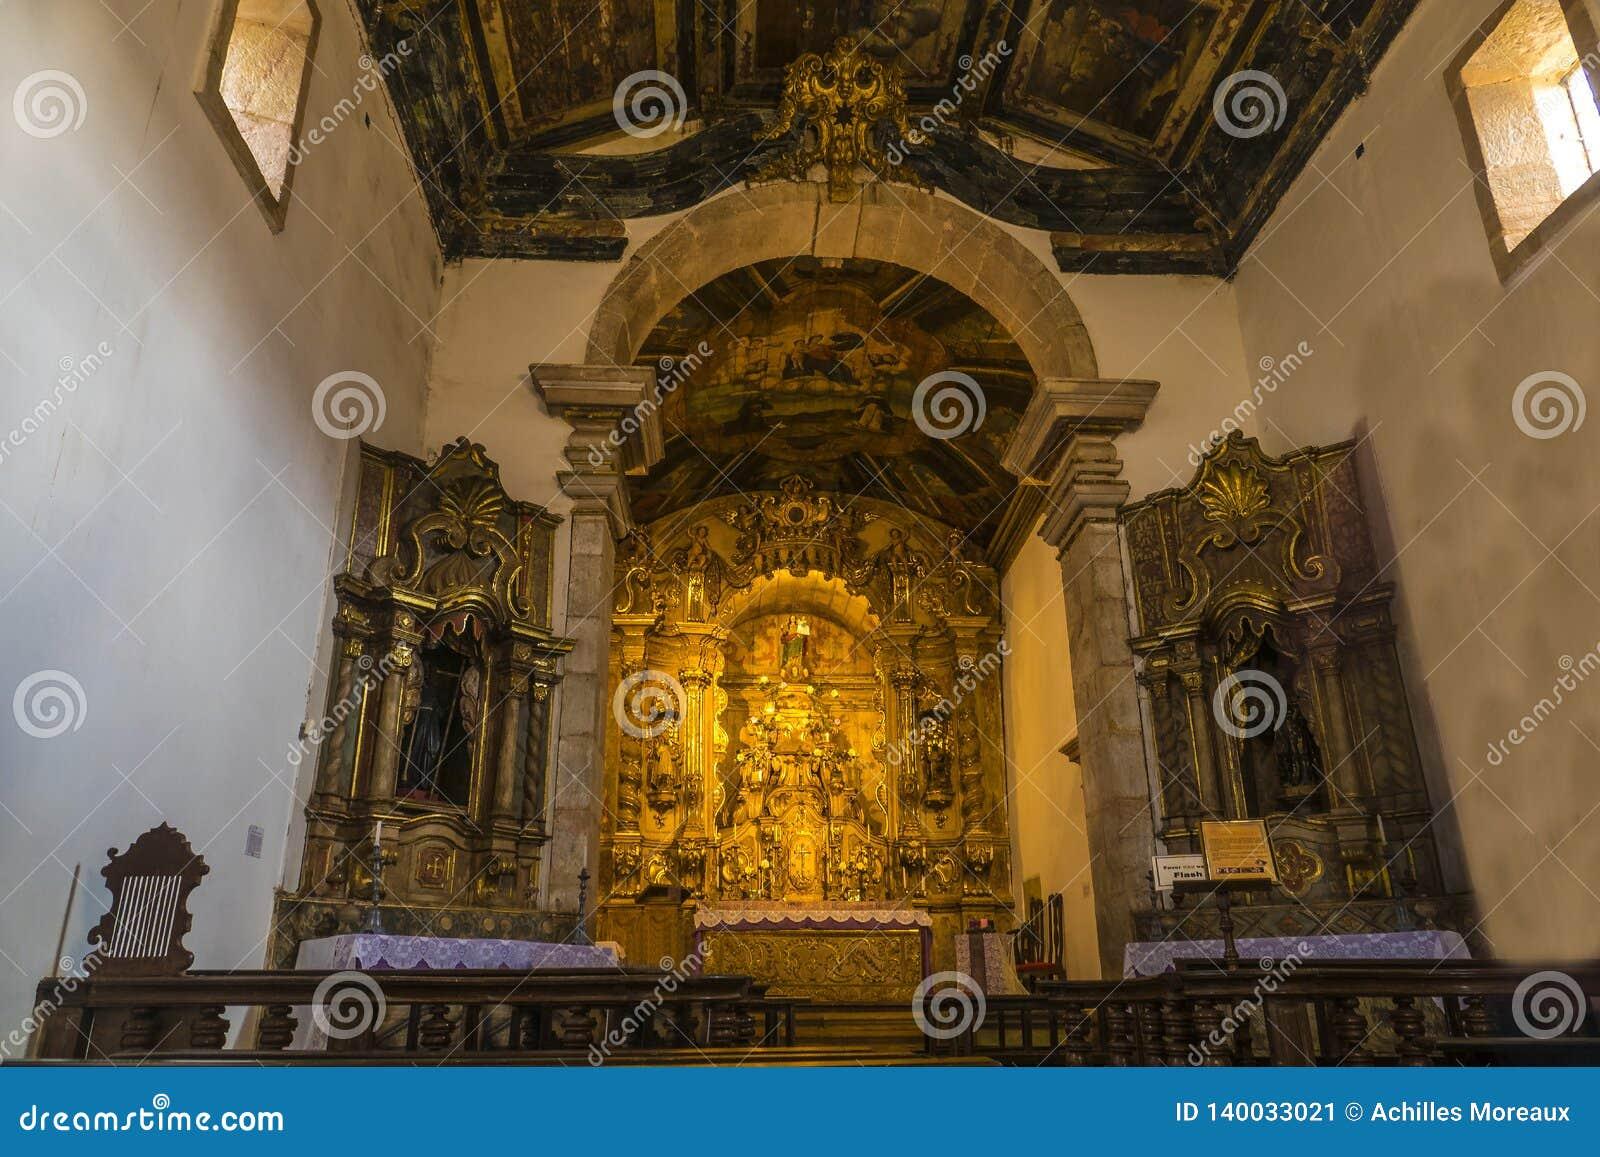 Tiradentes church interior